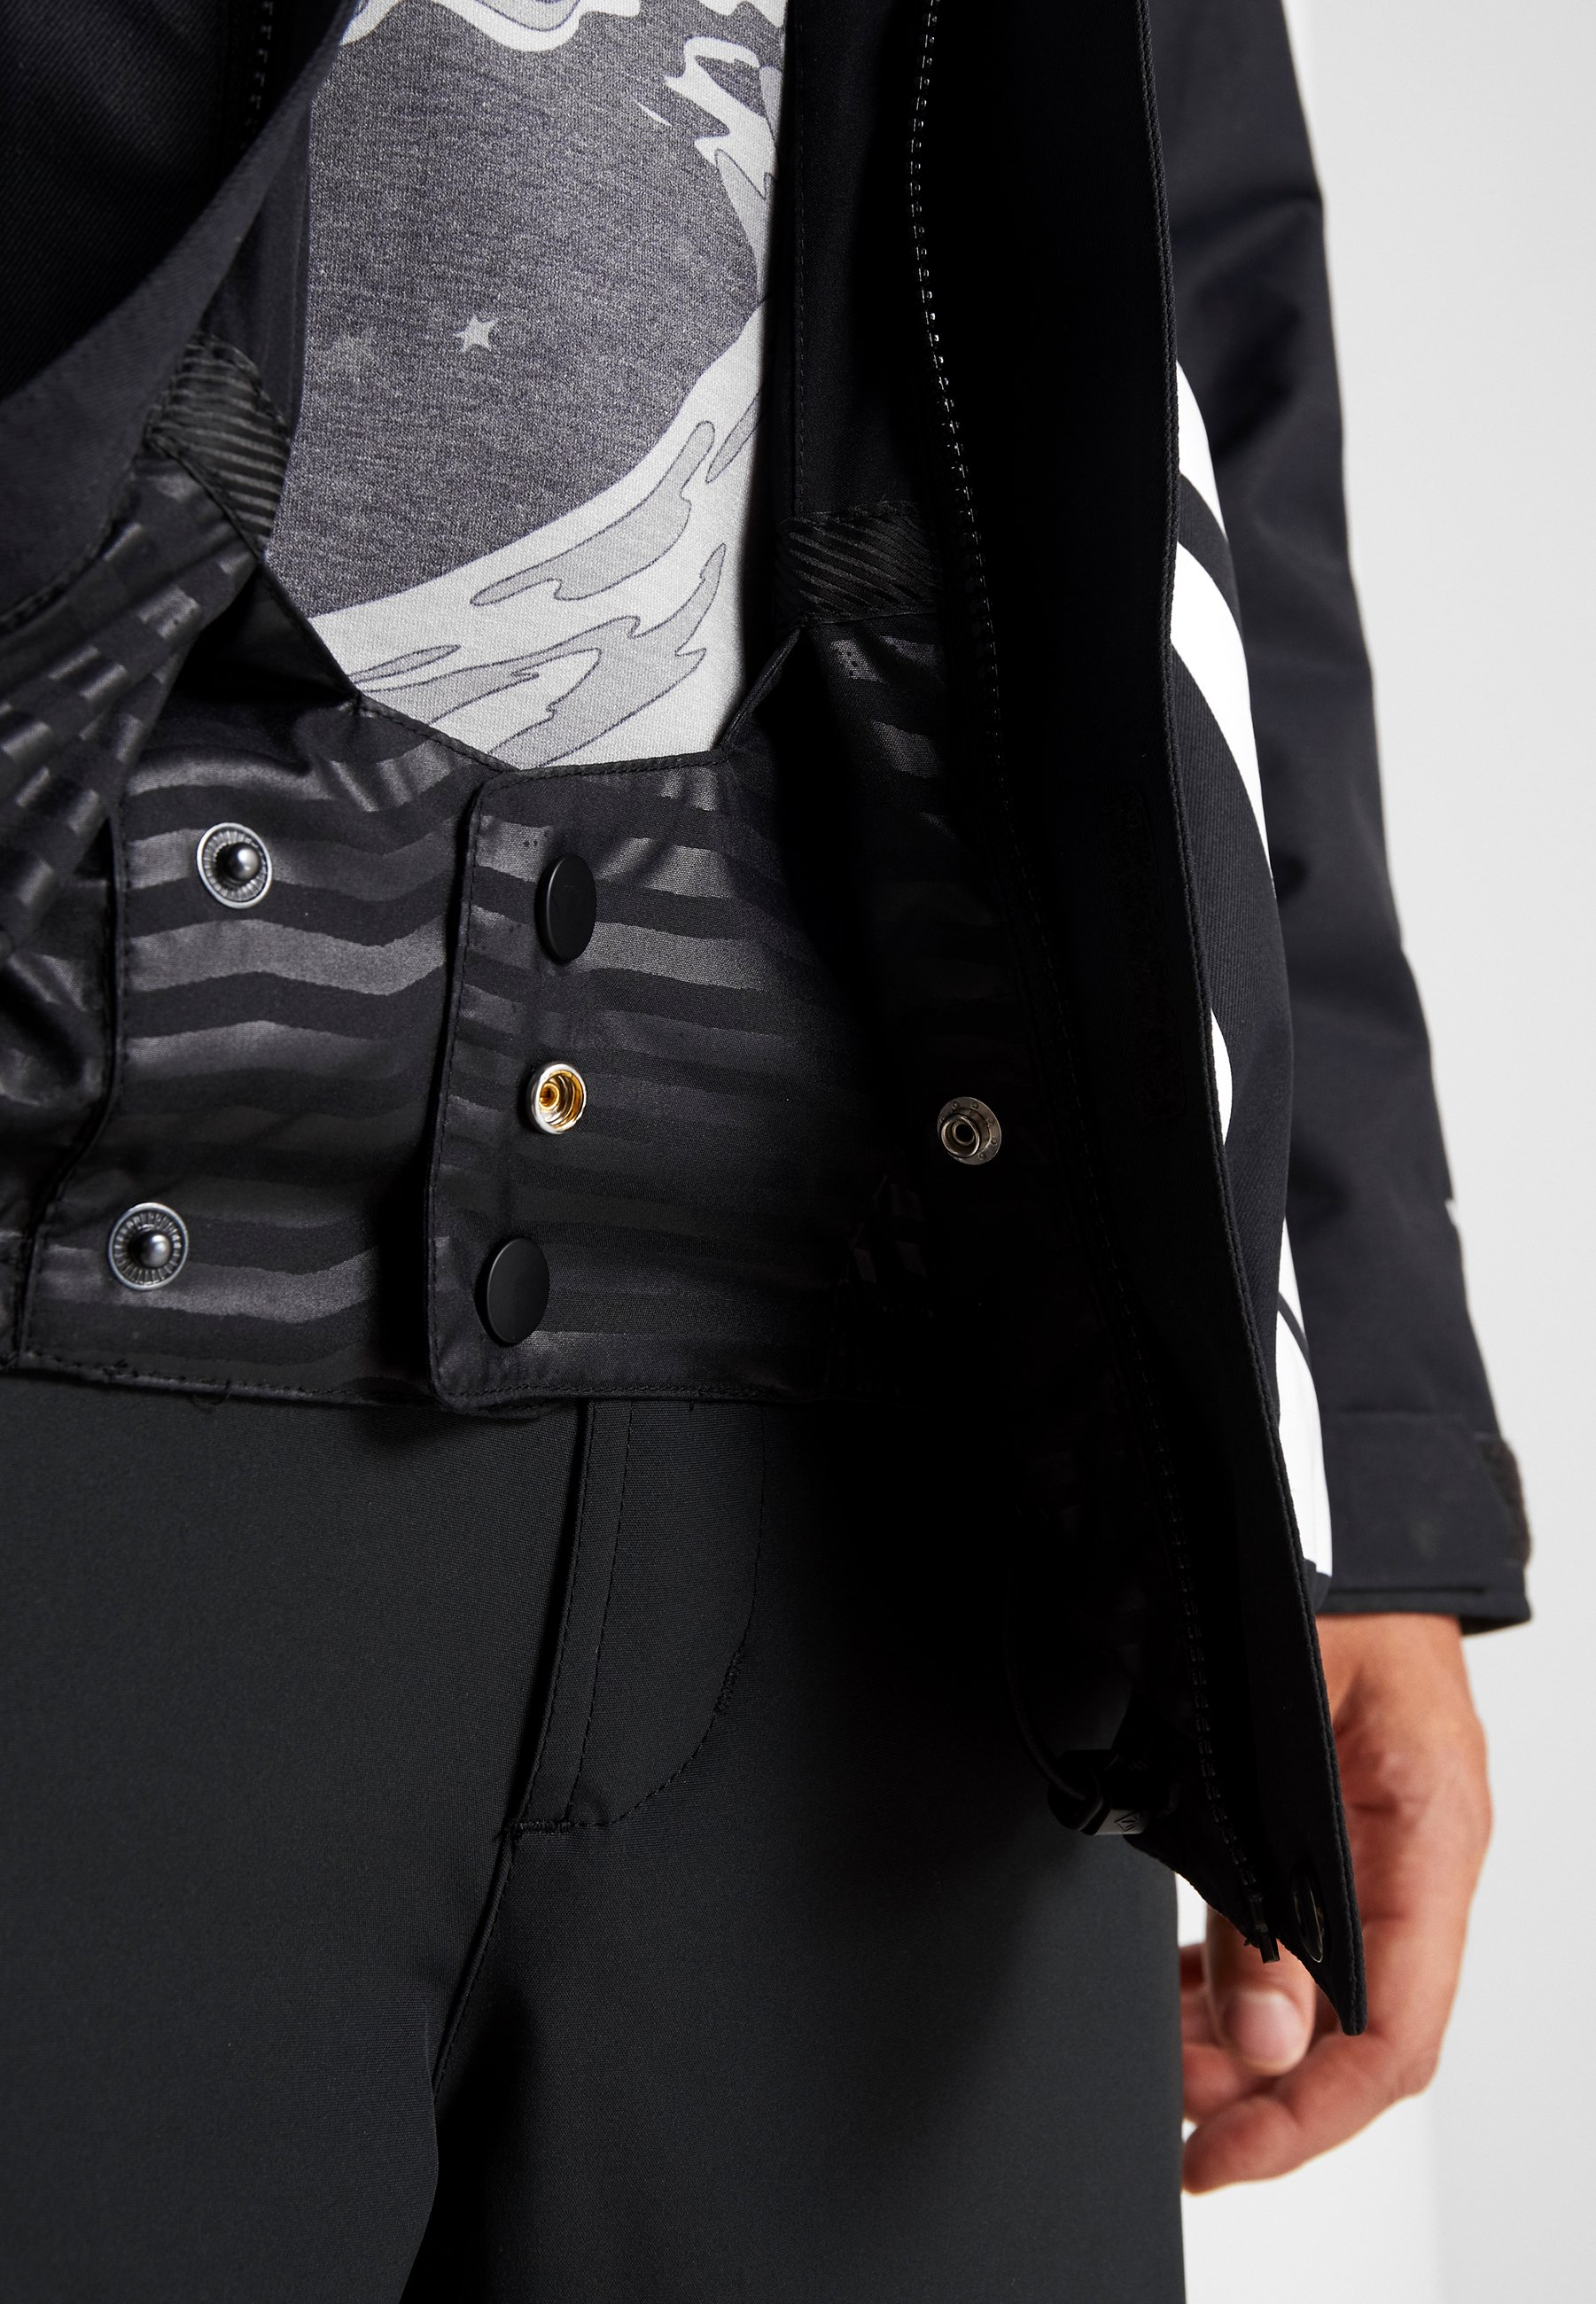 Volcom 17forty Jacket - Snowboardjacka Black